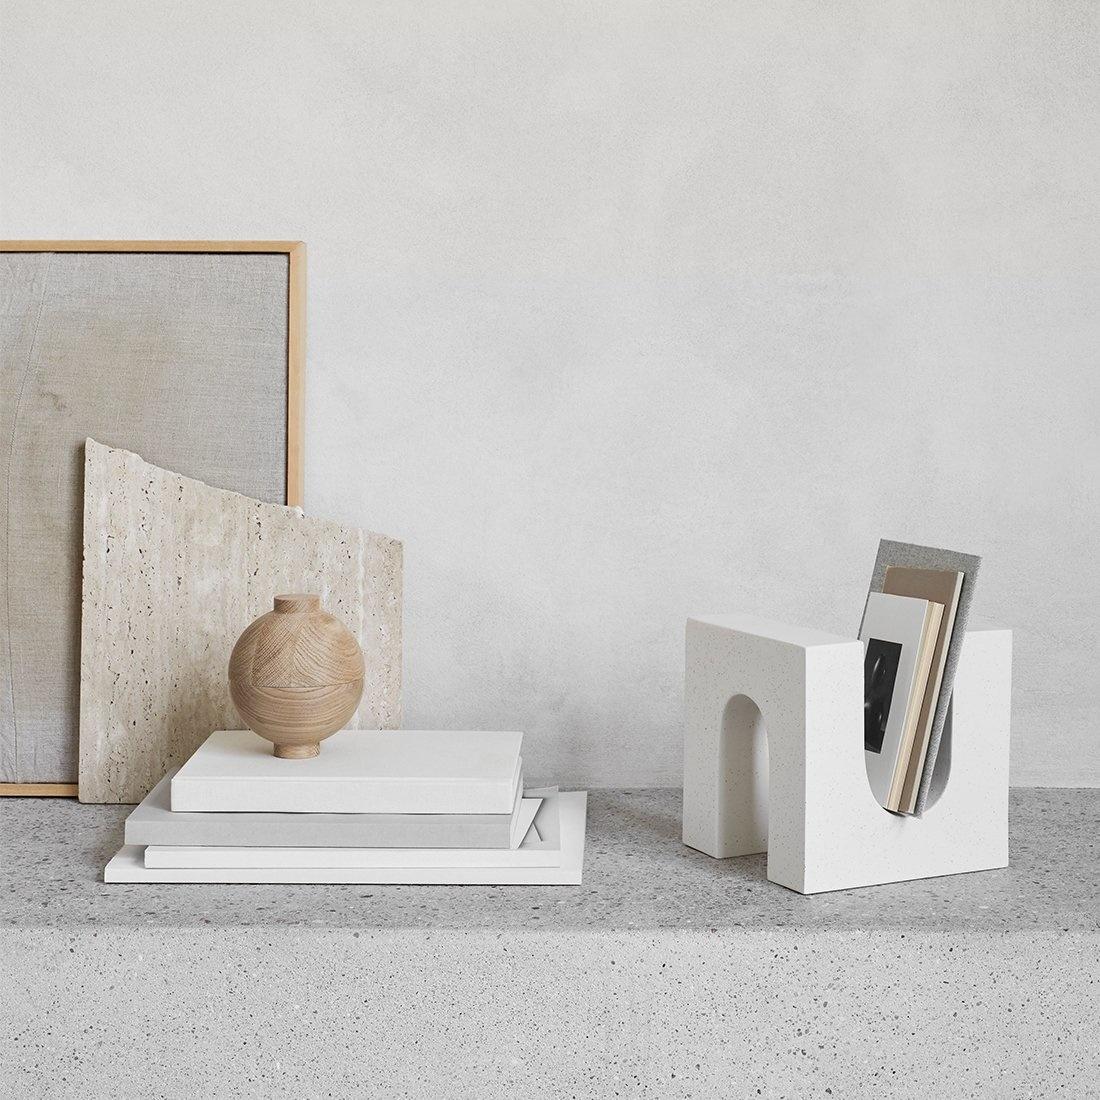 Brick sculpture-2